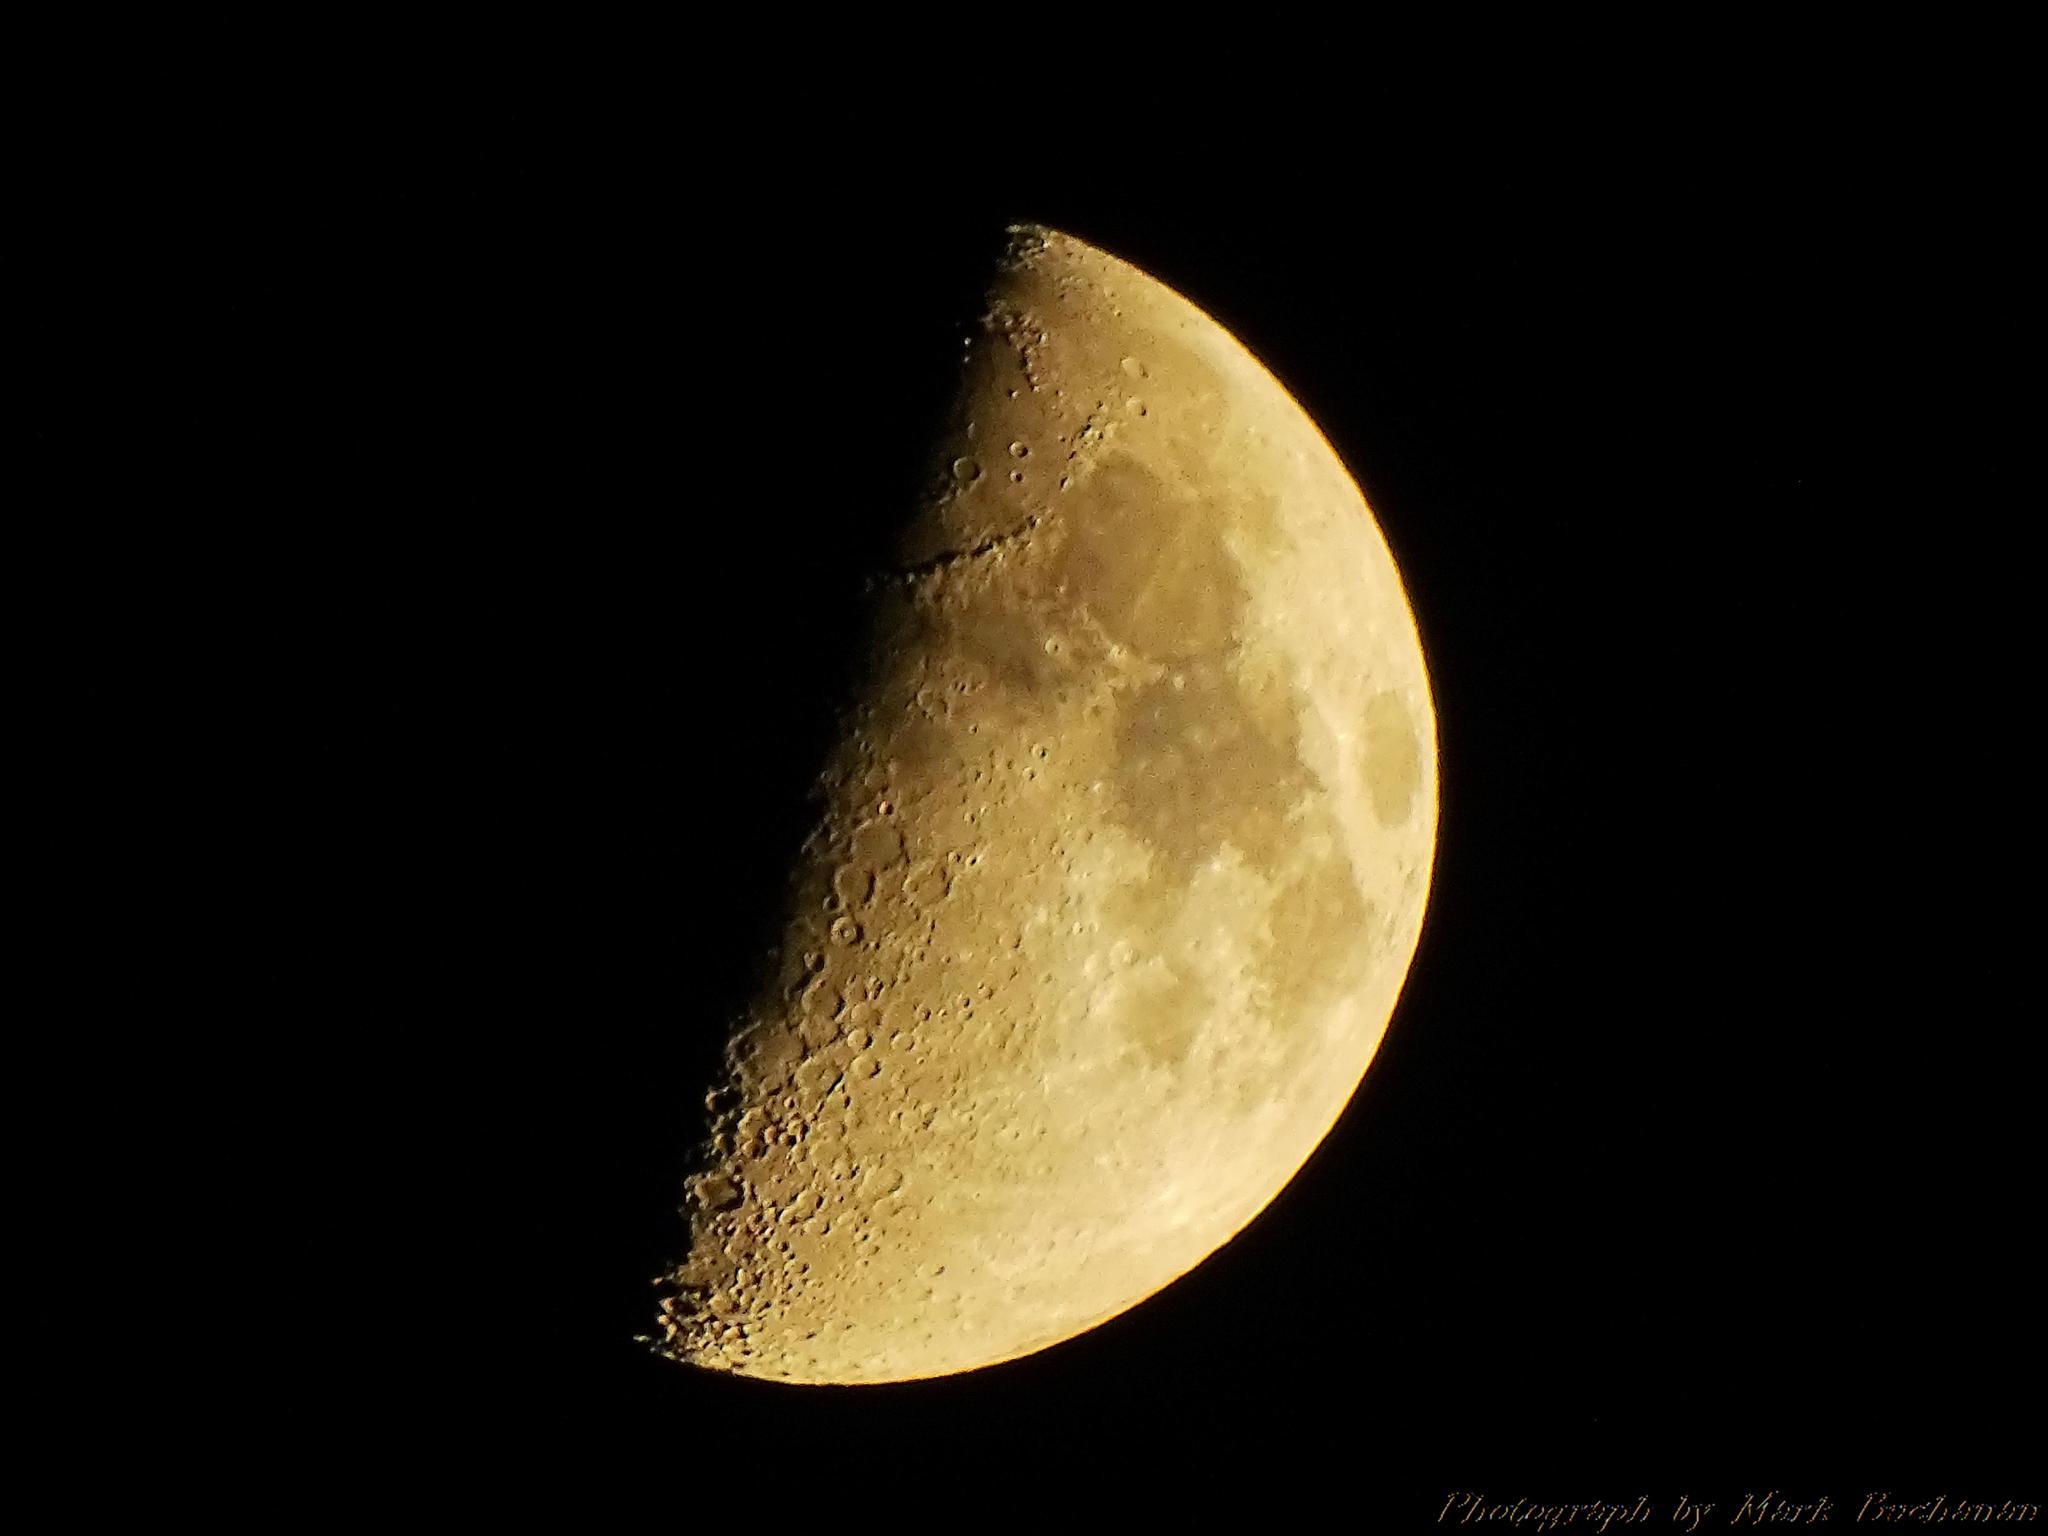 Half-moon closeup by Mark Buchanan